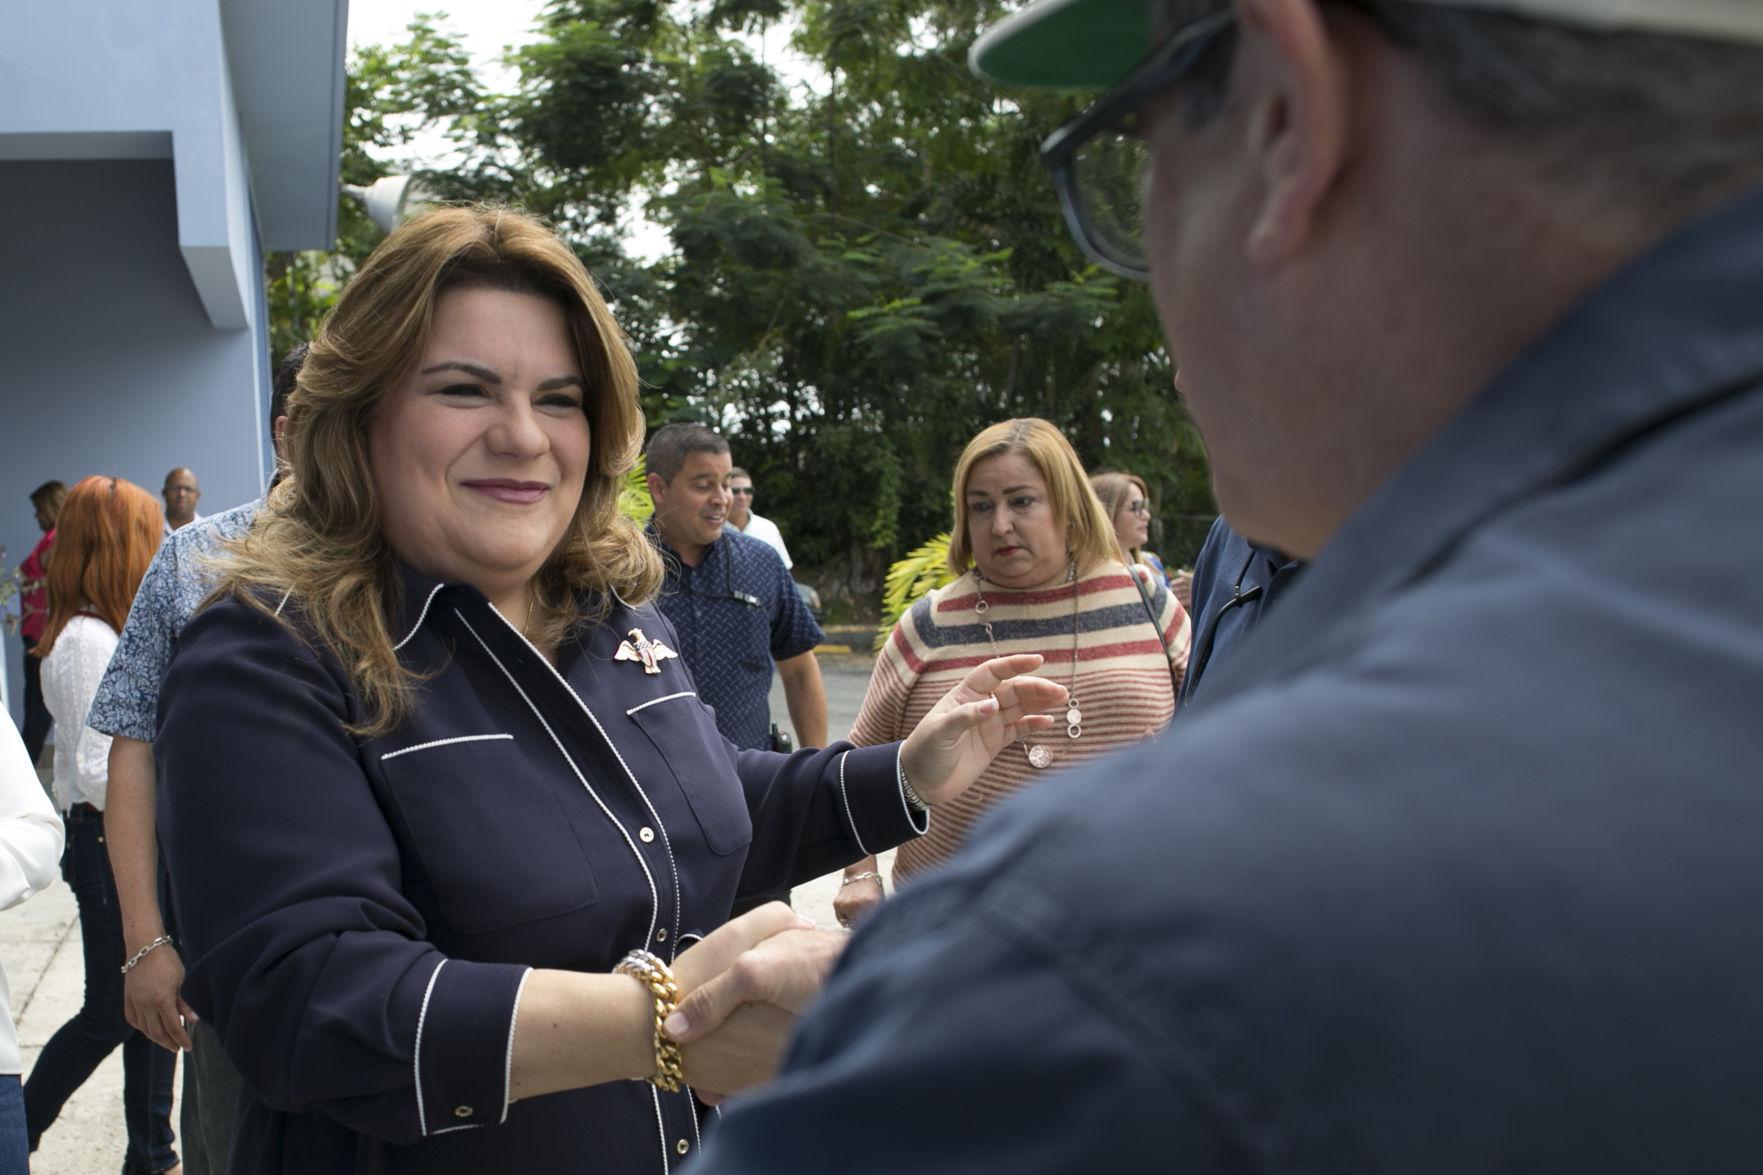 Alcaldes respaldan llamado de comisionada a abrir comedores escolares